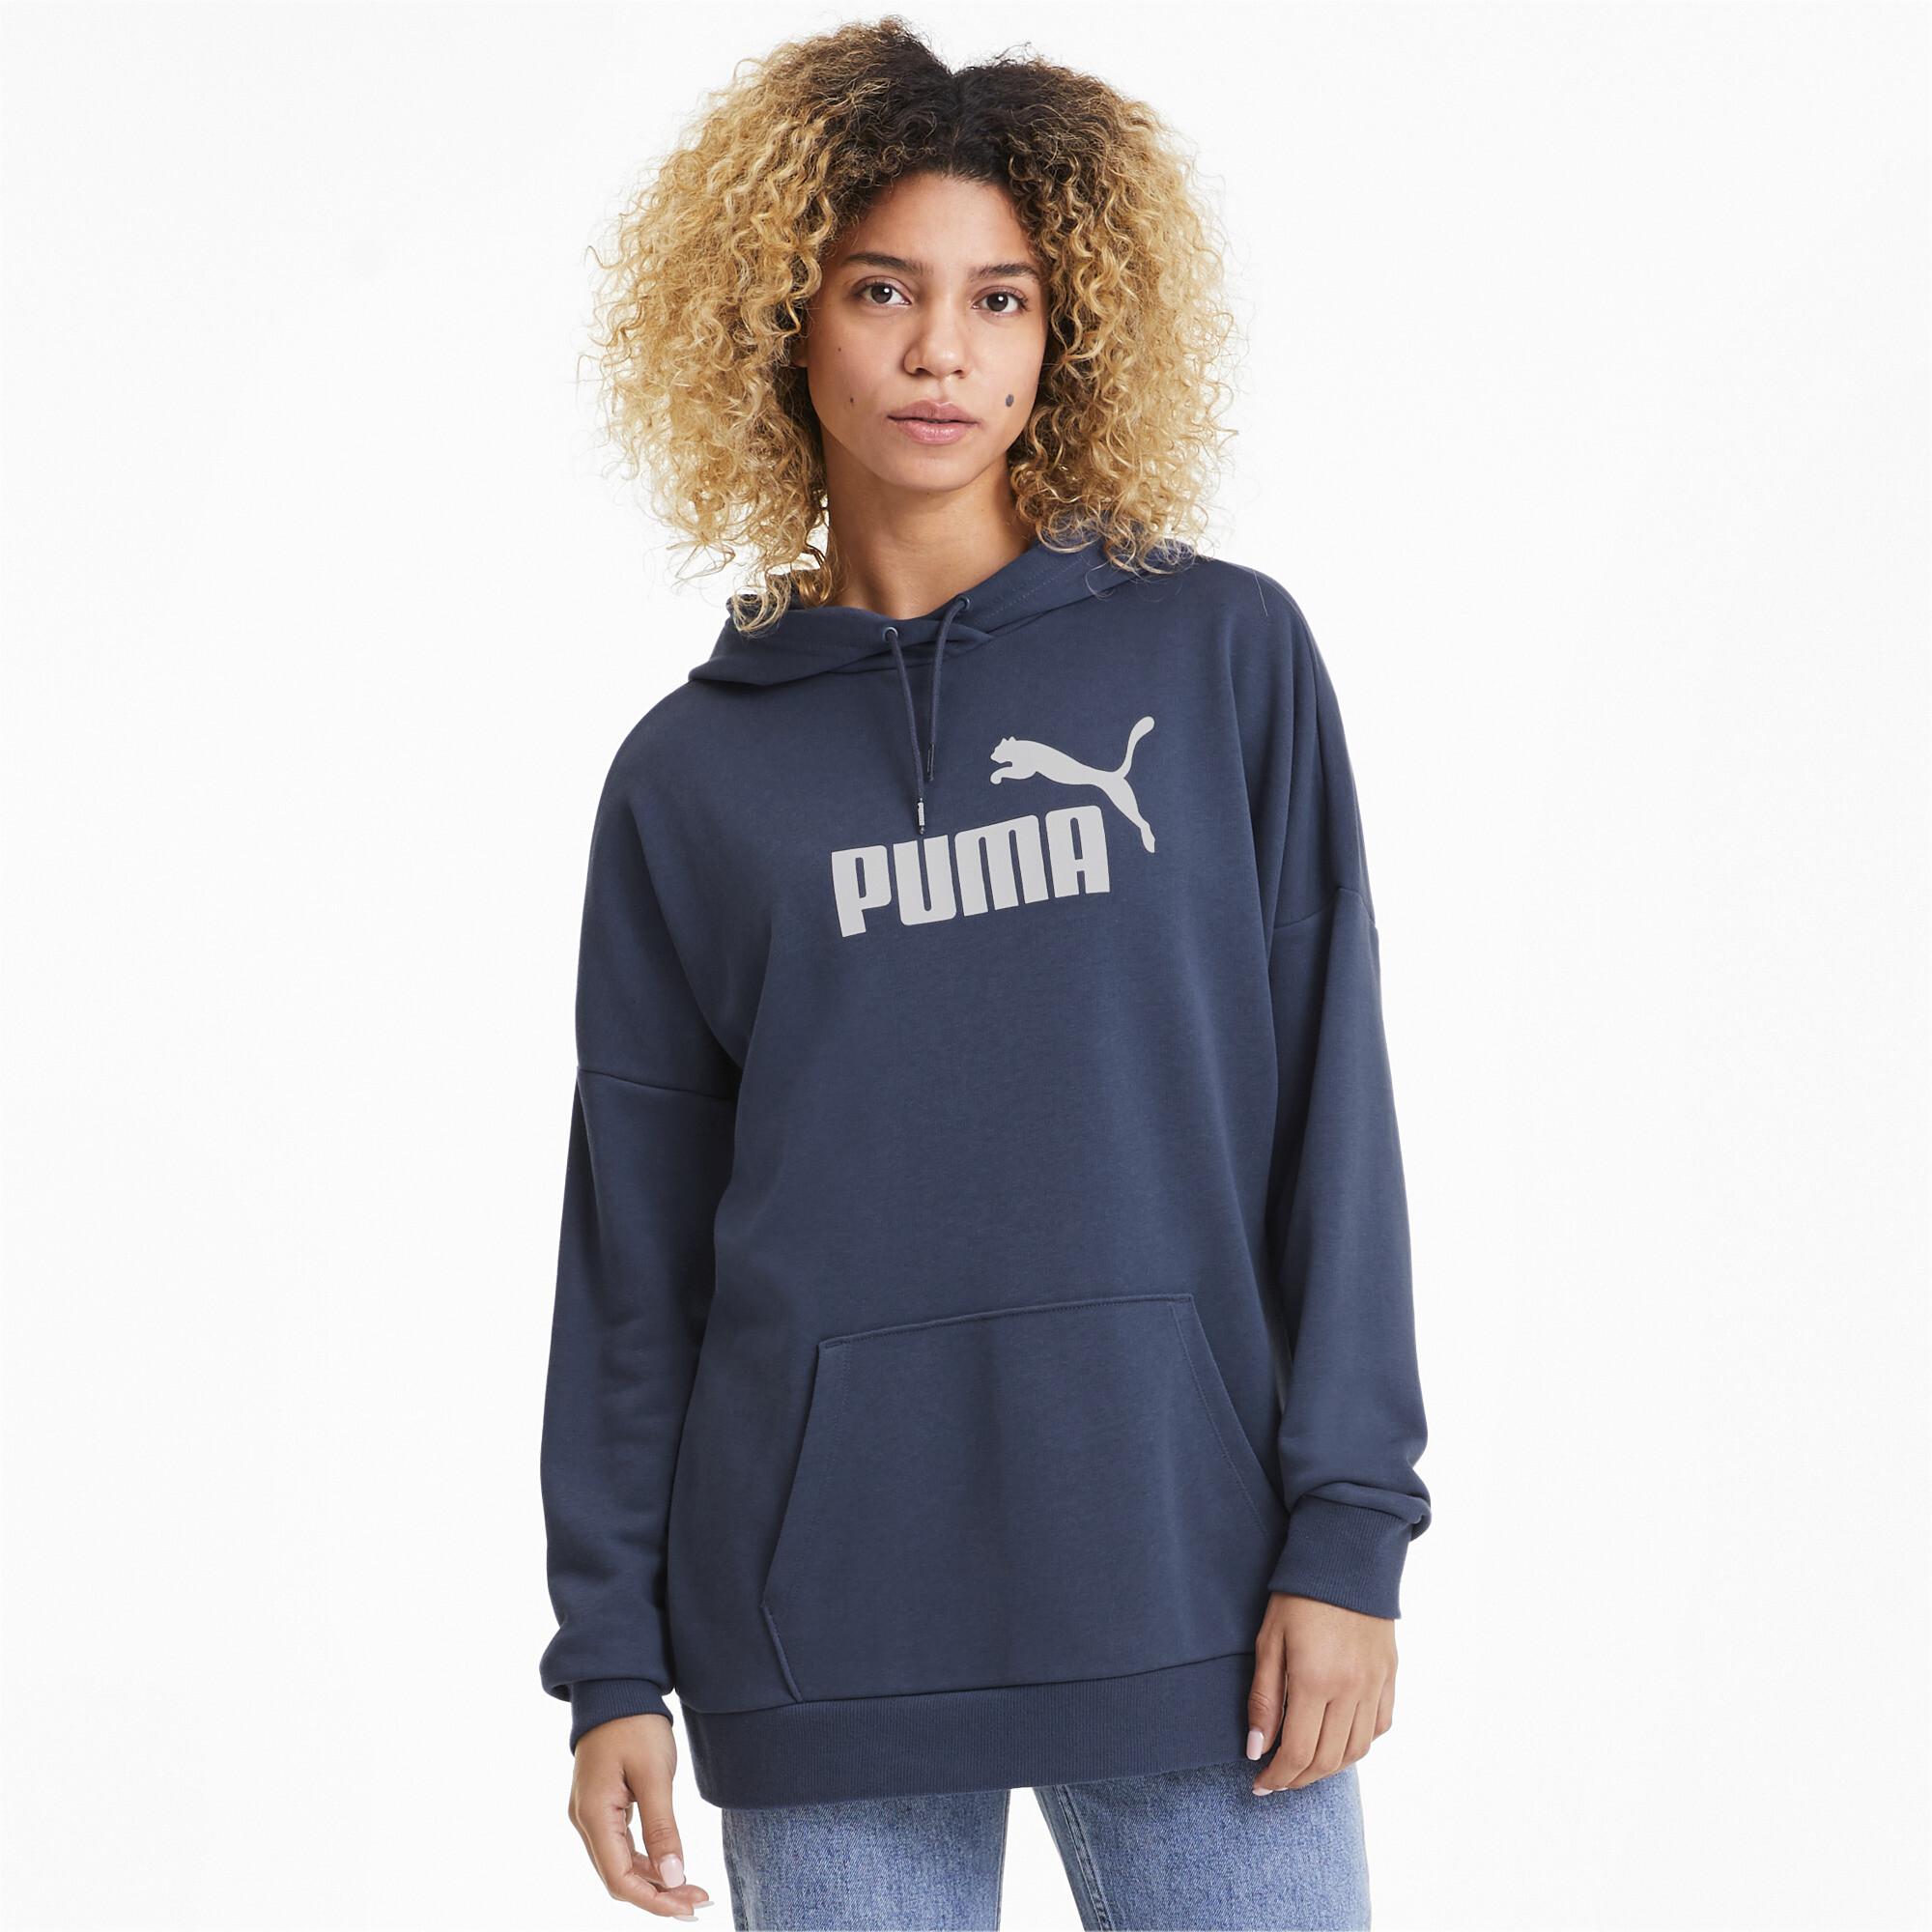 PUMA-Women-039-s-Essentials-Elongated-Hoodie thumbnail 19